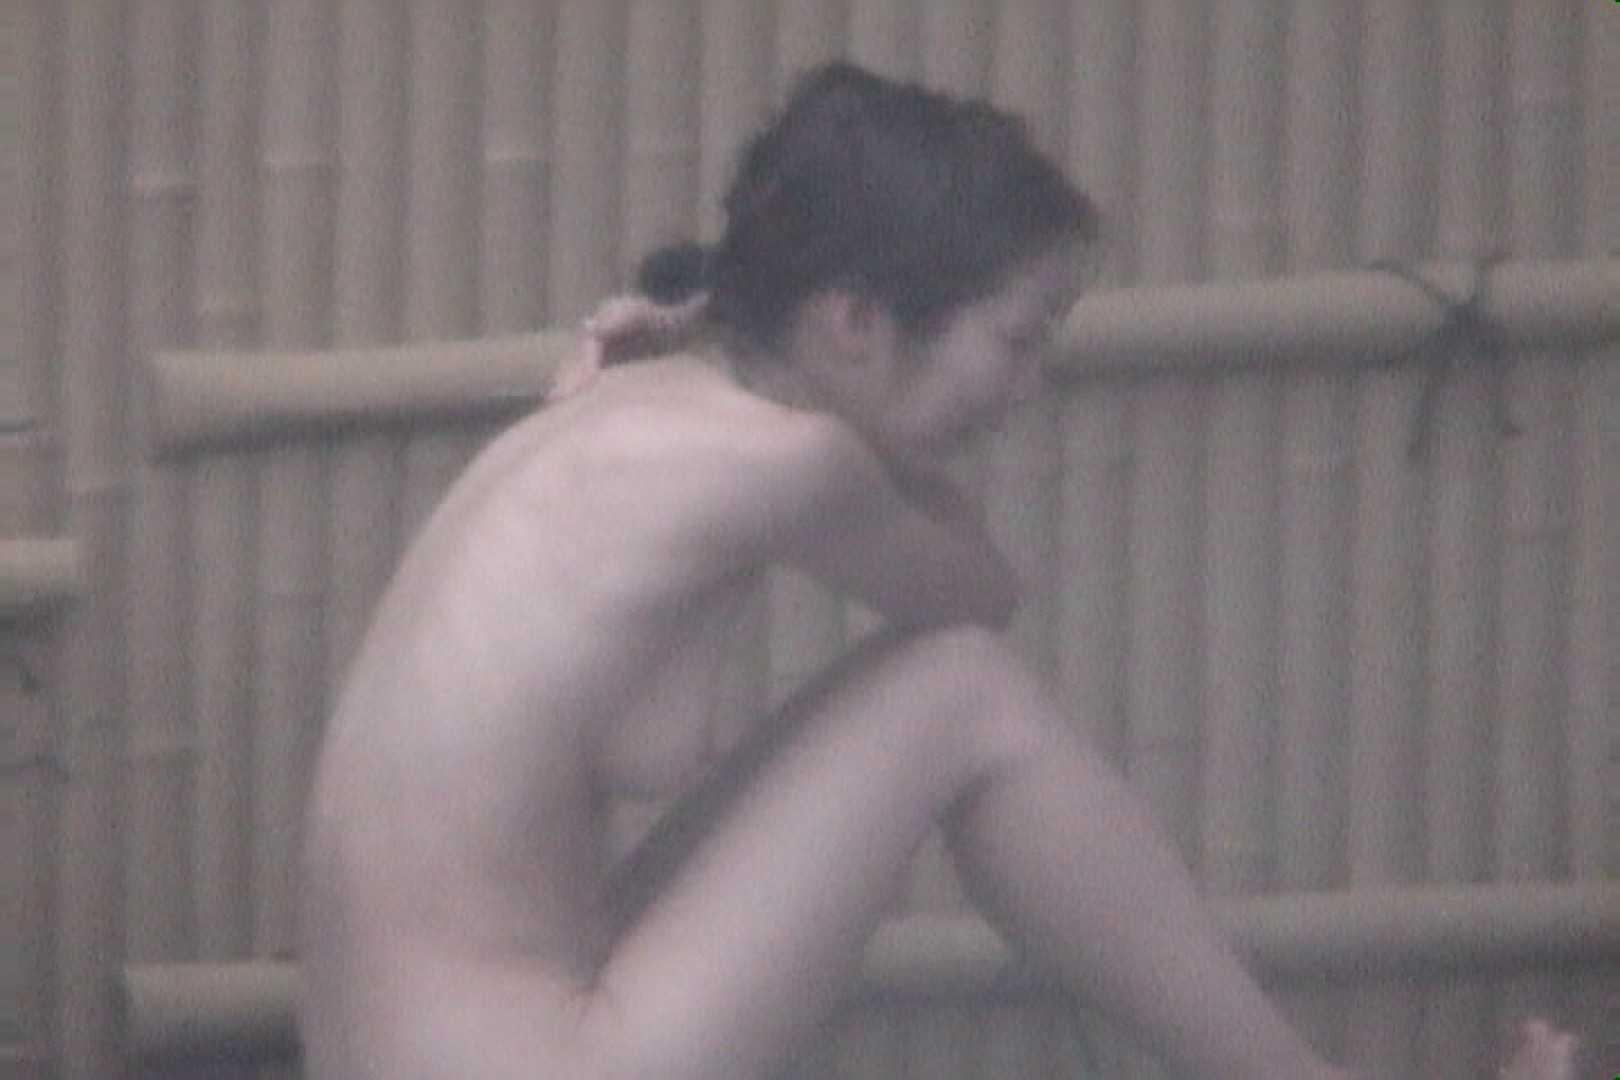 Aquaな露天風呂Vol.82【VIP限定】 露天風呂 | OLのエロ生活  51連発 34